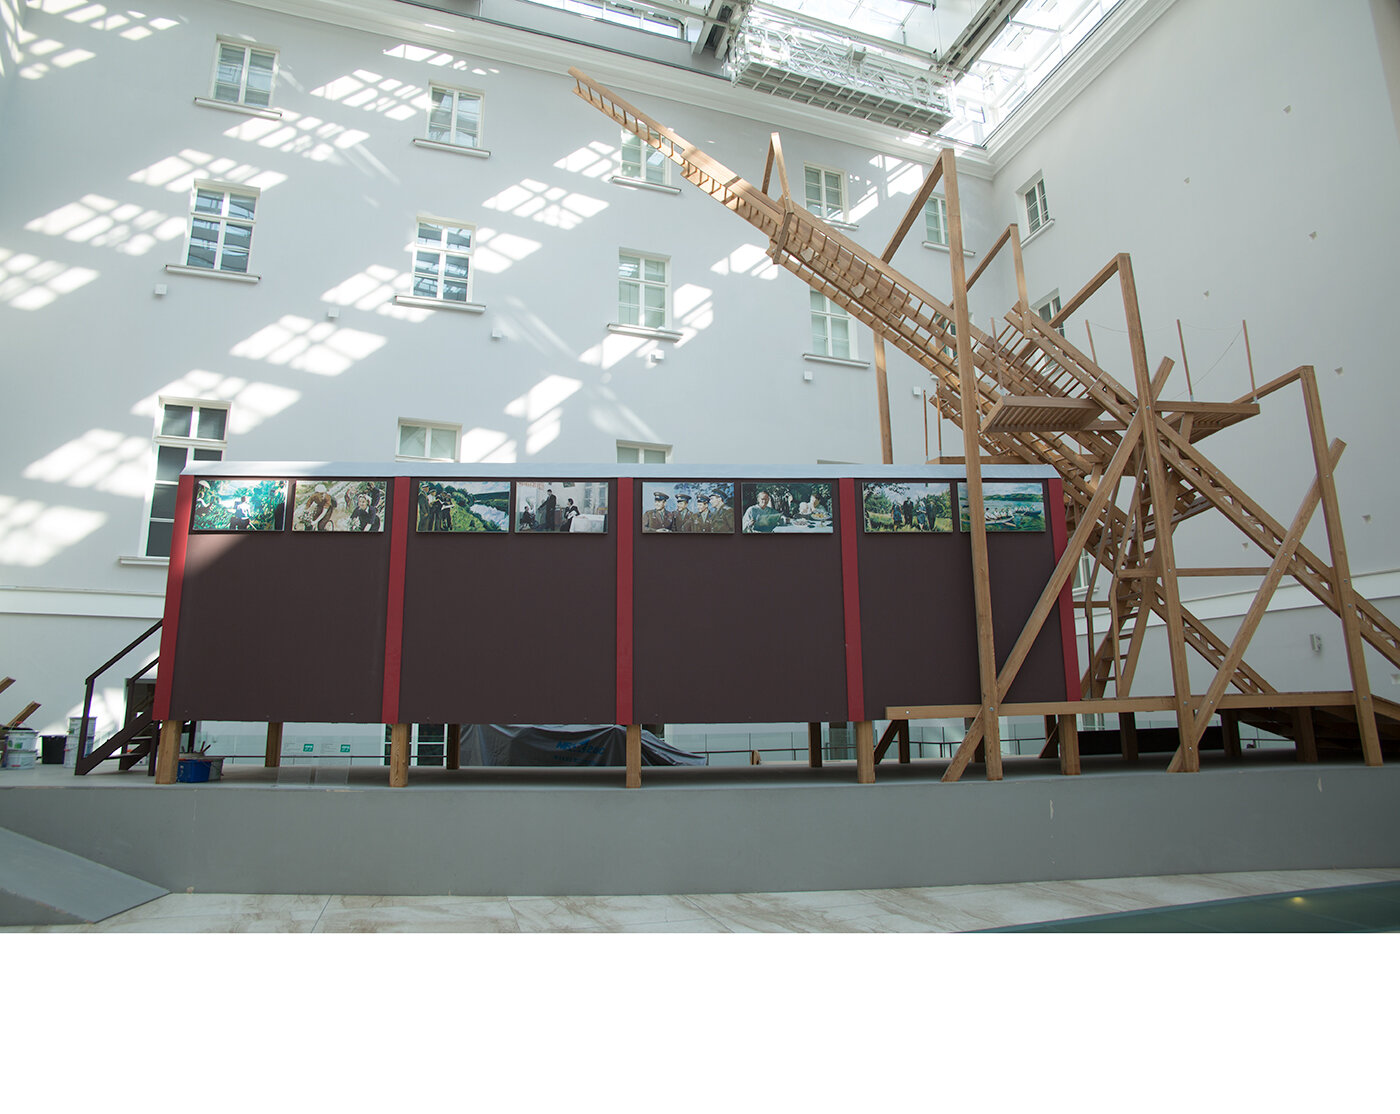 View-of-installation-Hermitage-State-Museum-St.-Petersburg-Russia-2017-3.jpg